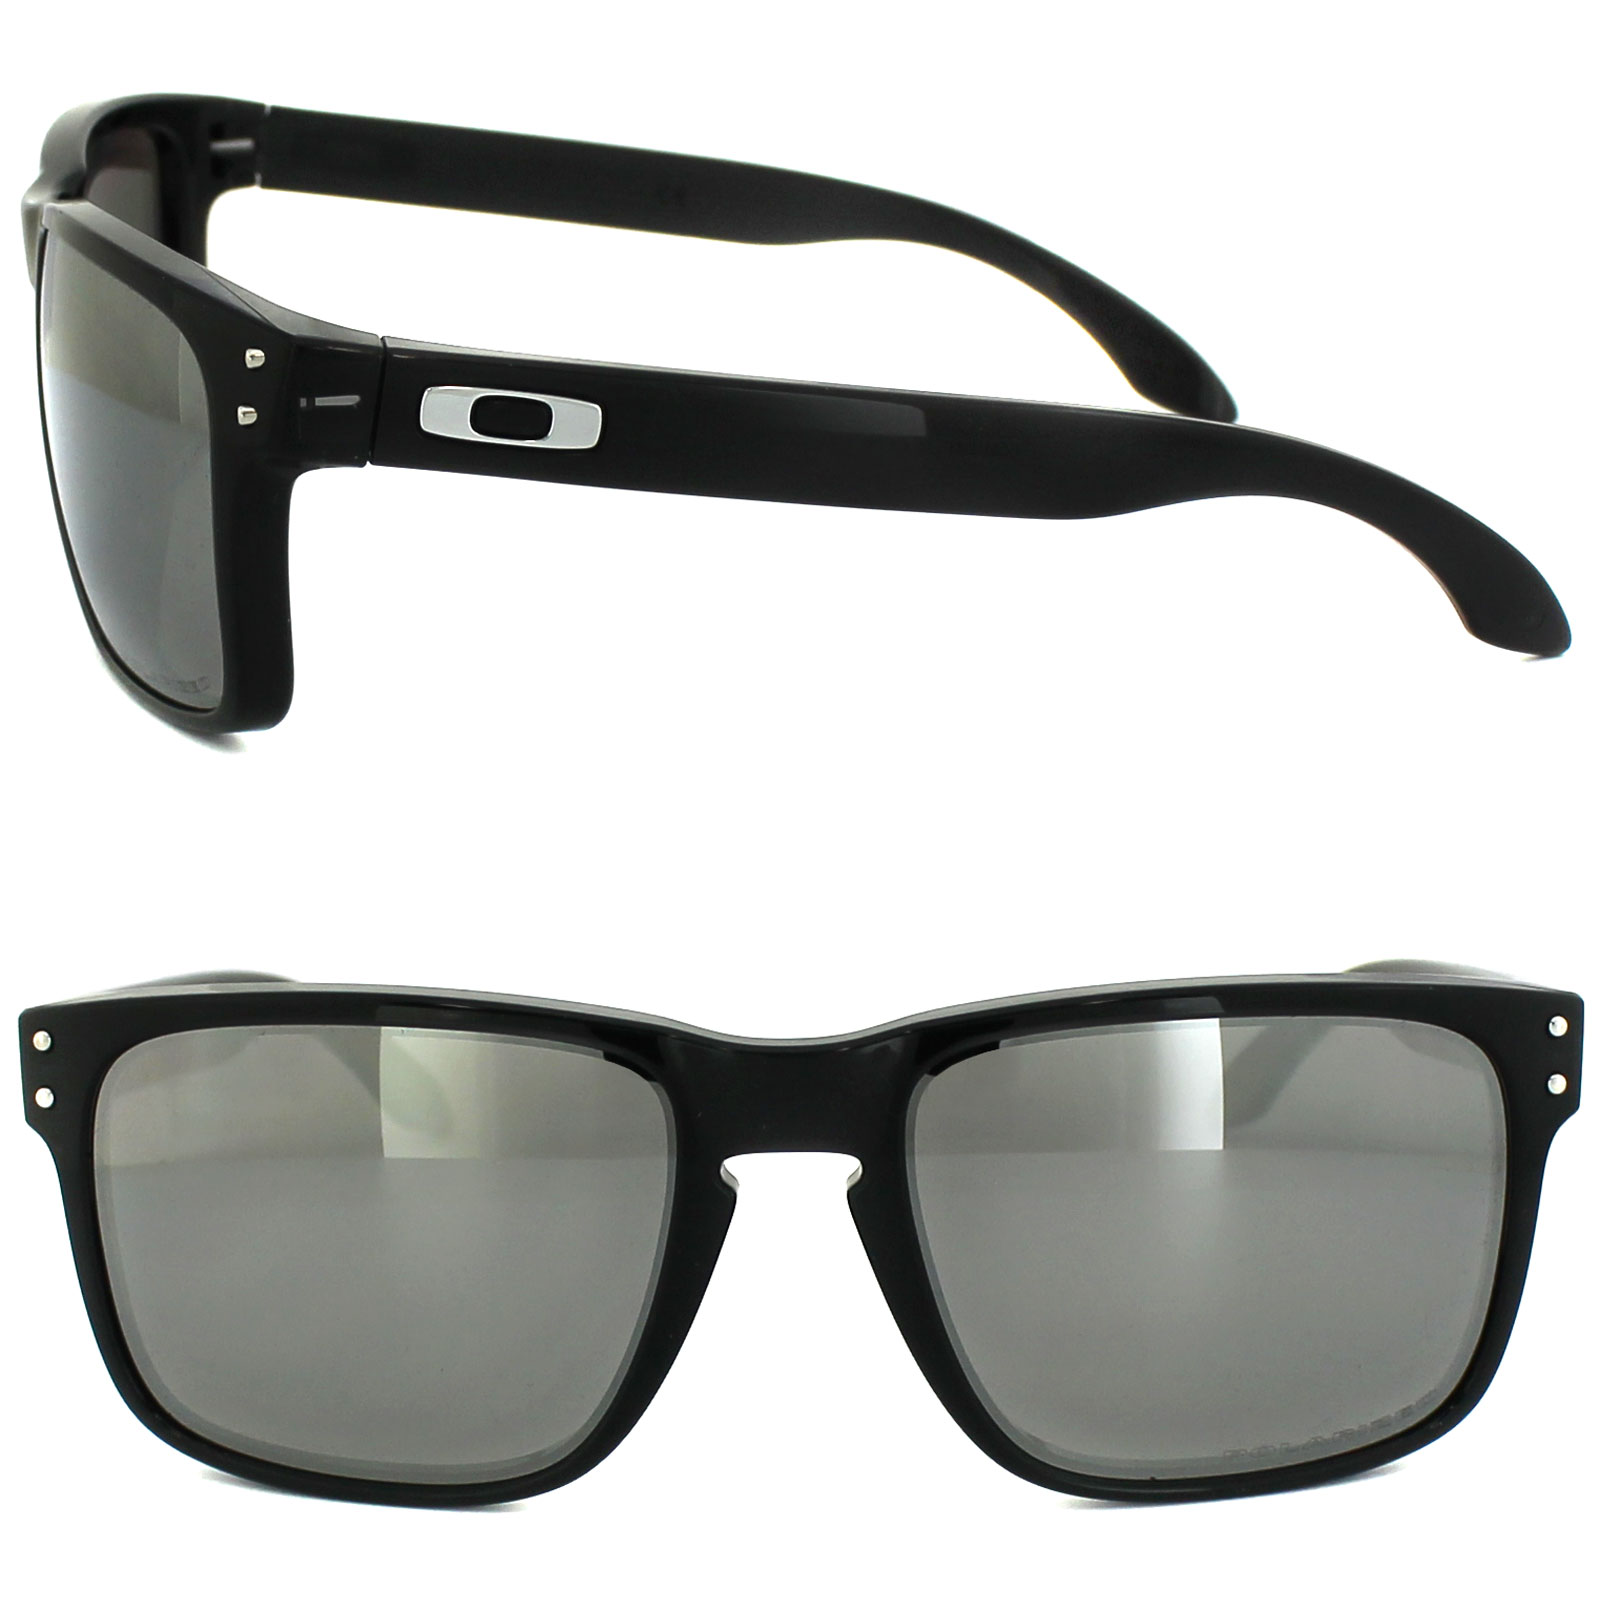 20a0fca090 Sunglasses Oakley Holbrook Chrome Iridium Polarized « Heritage Malta